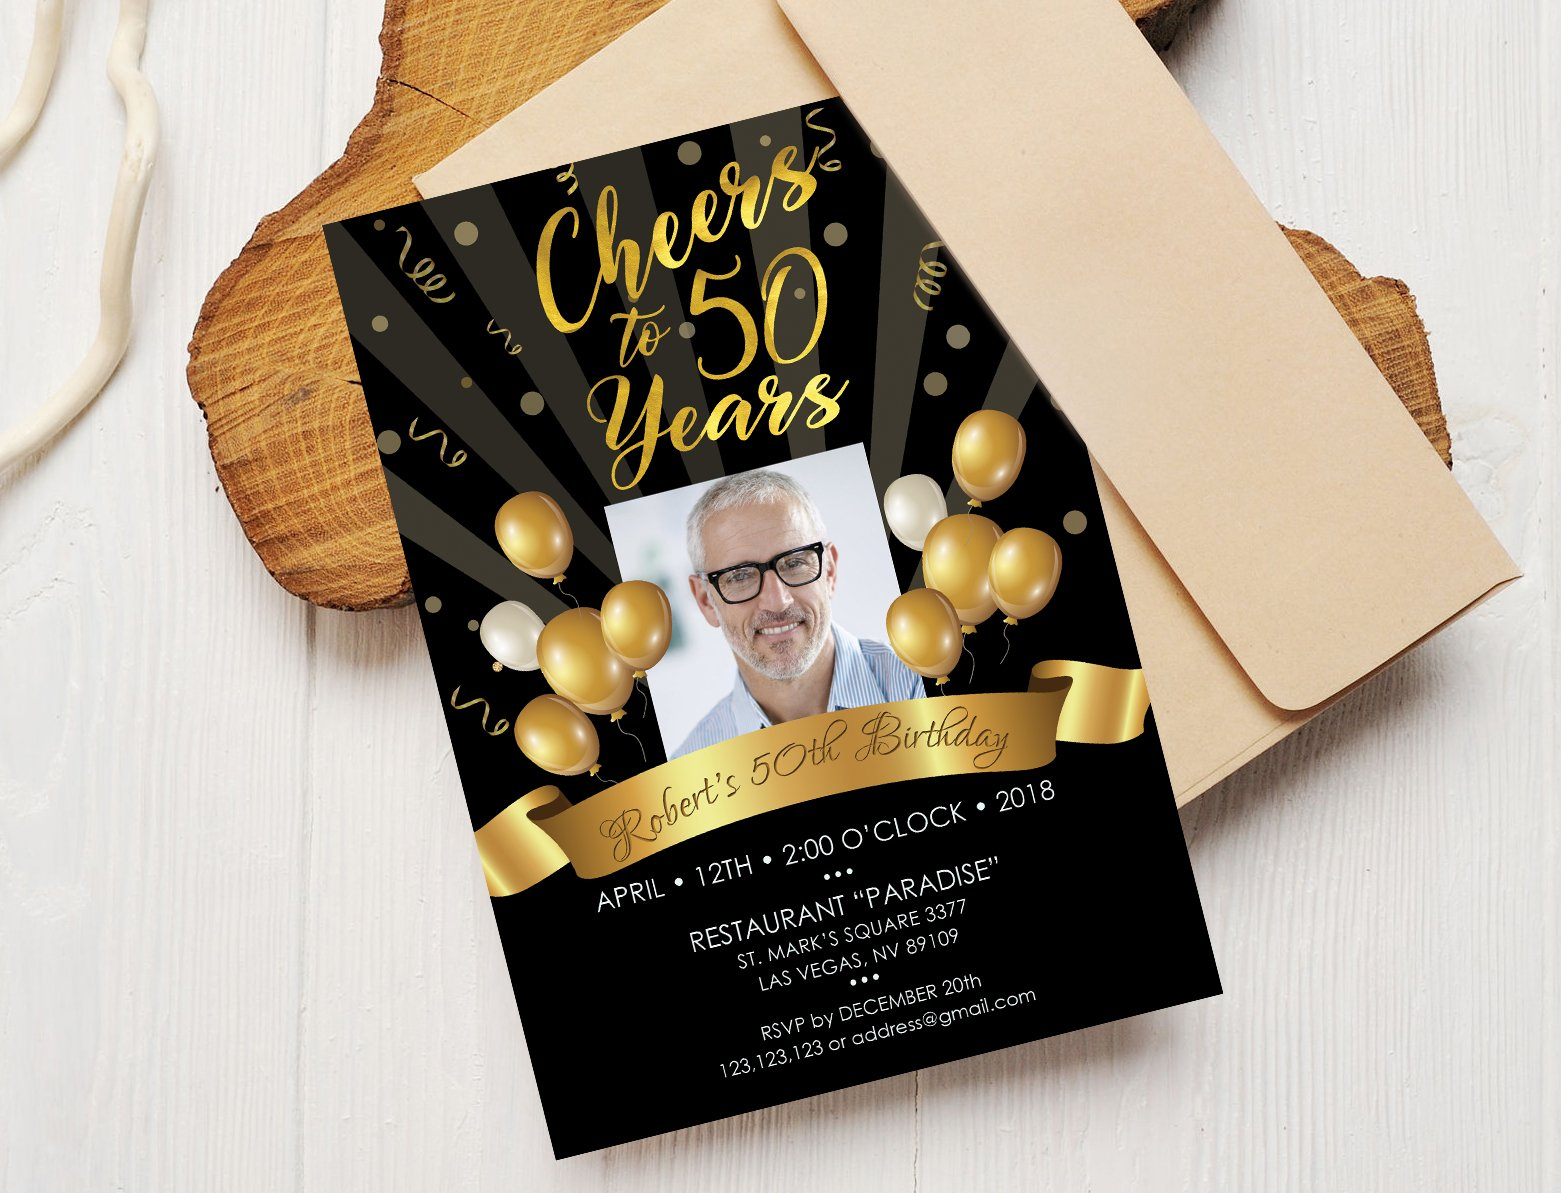 50th Birthday Invitation Black Gold | Creative Photoshop Templates ~  Creative Market